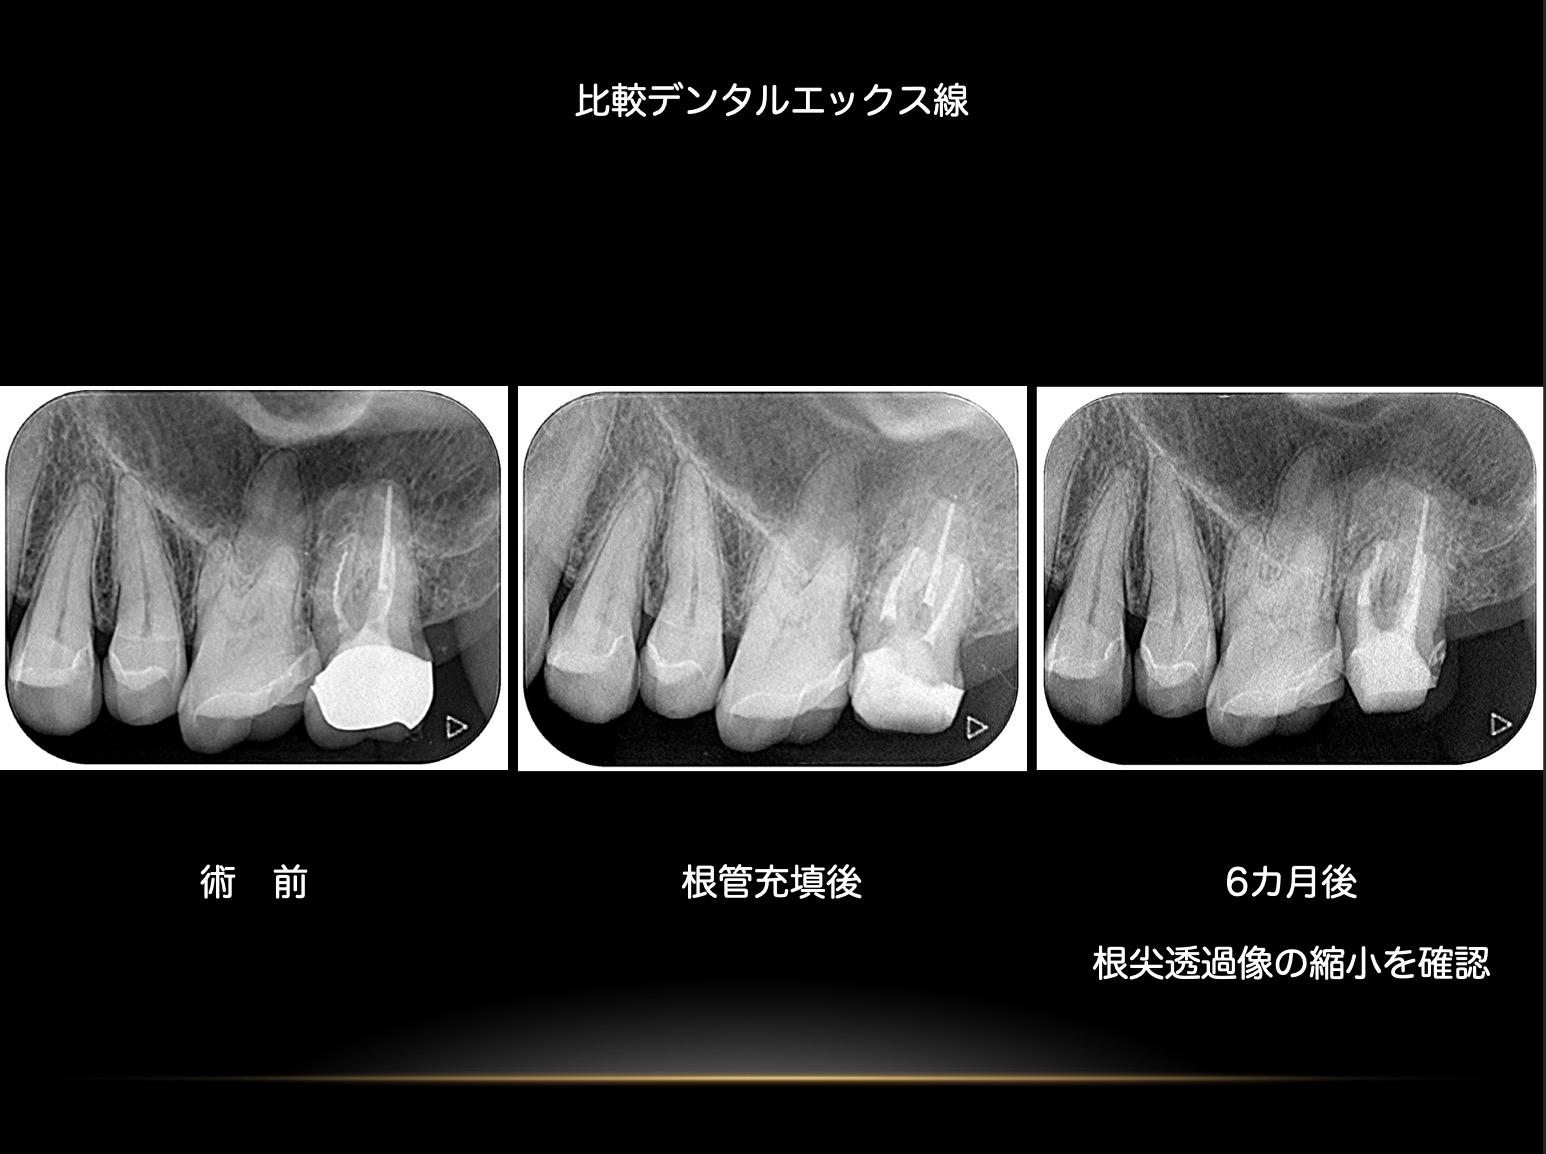 pic2020-04-20-15-23-58.jpg